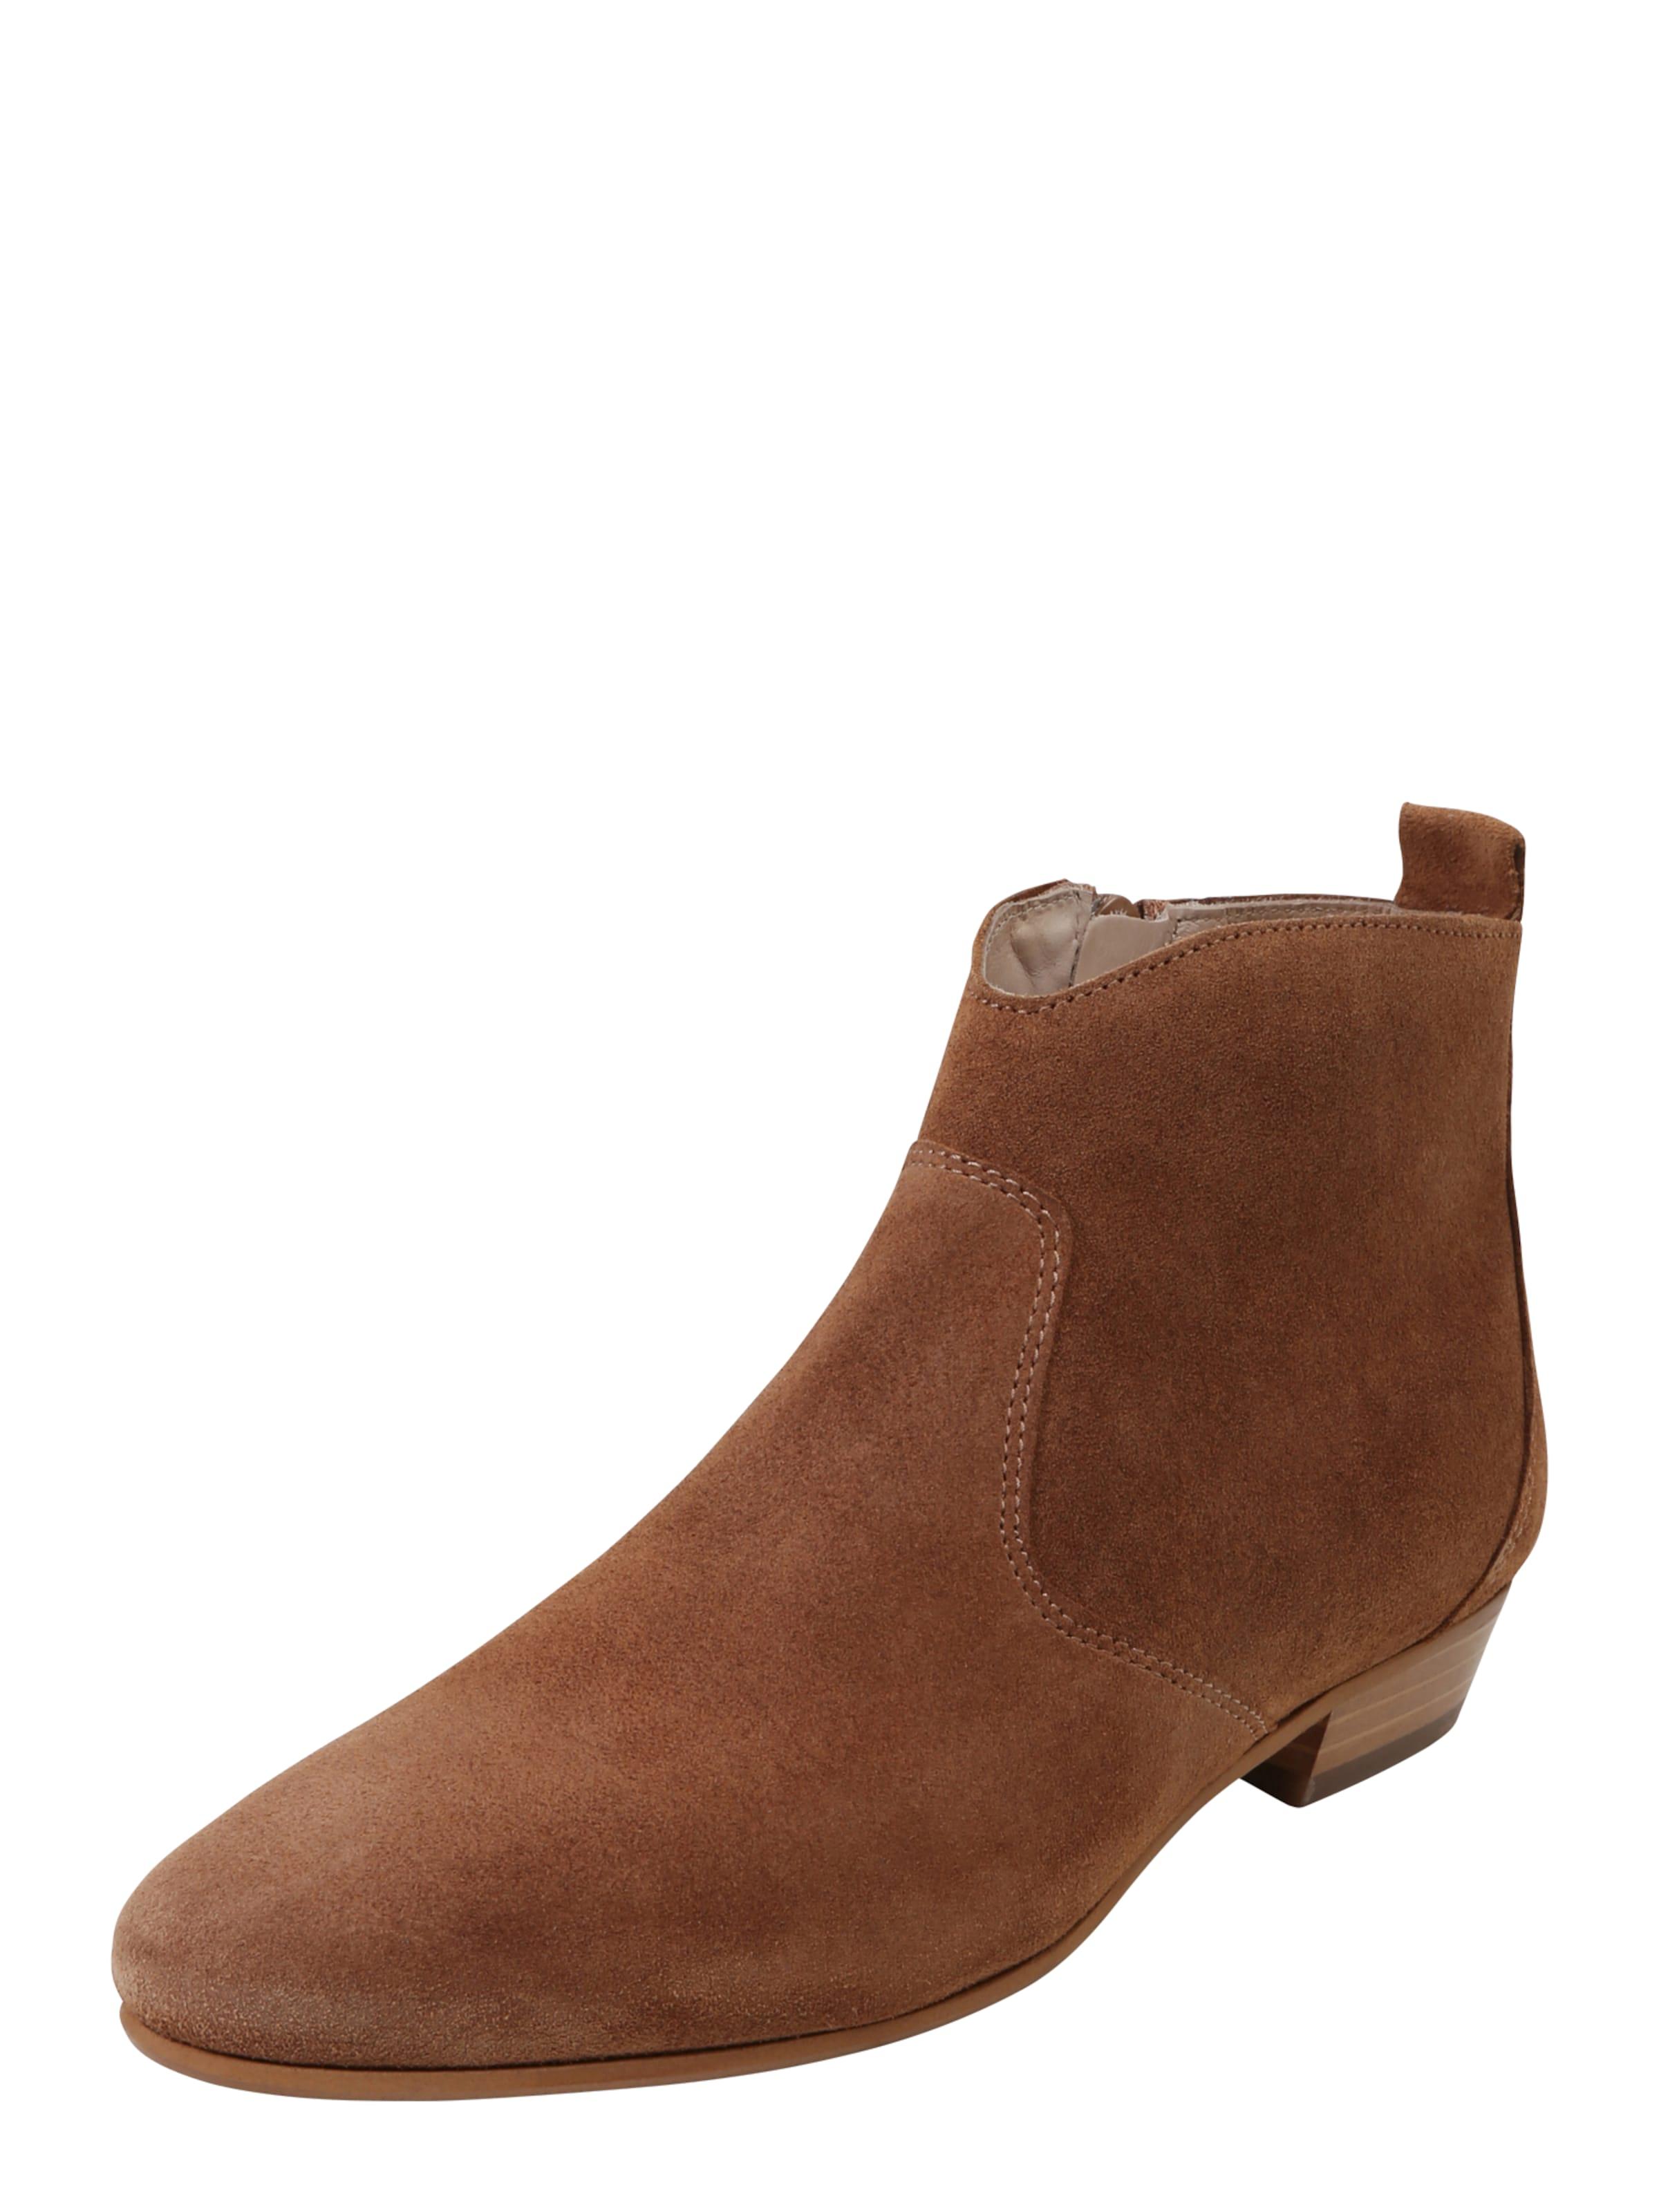 Haltbare Mode billige Schuhe Marc O'Polo   Stiefelette Schuhe Gut getragene Schuhe